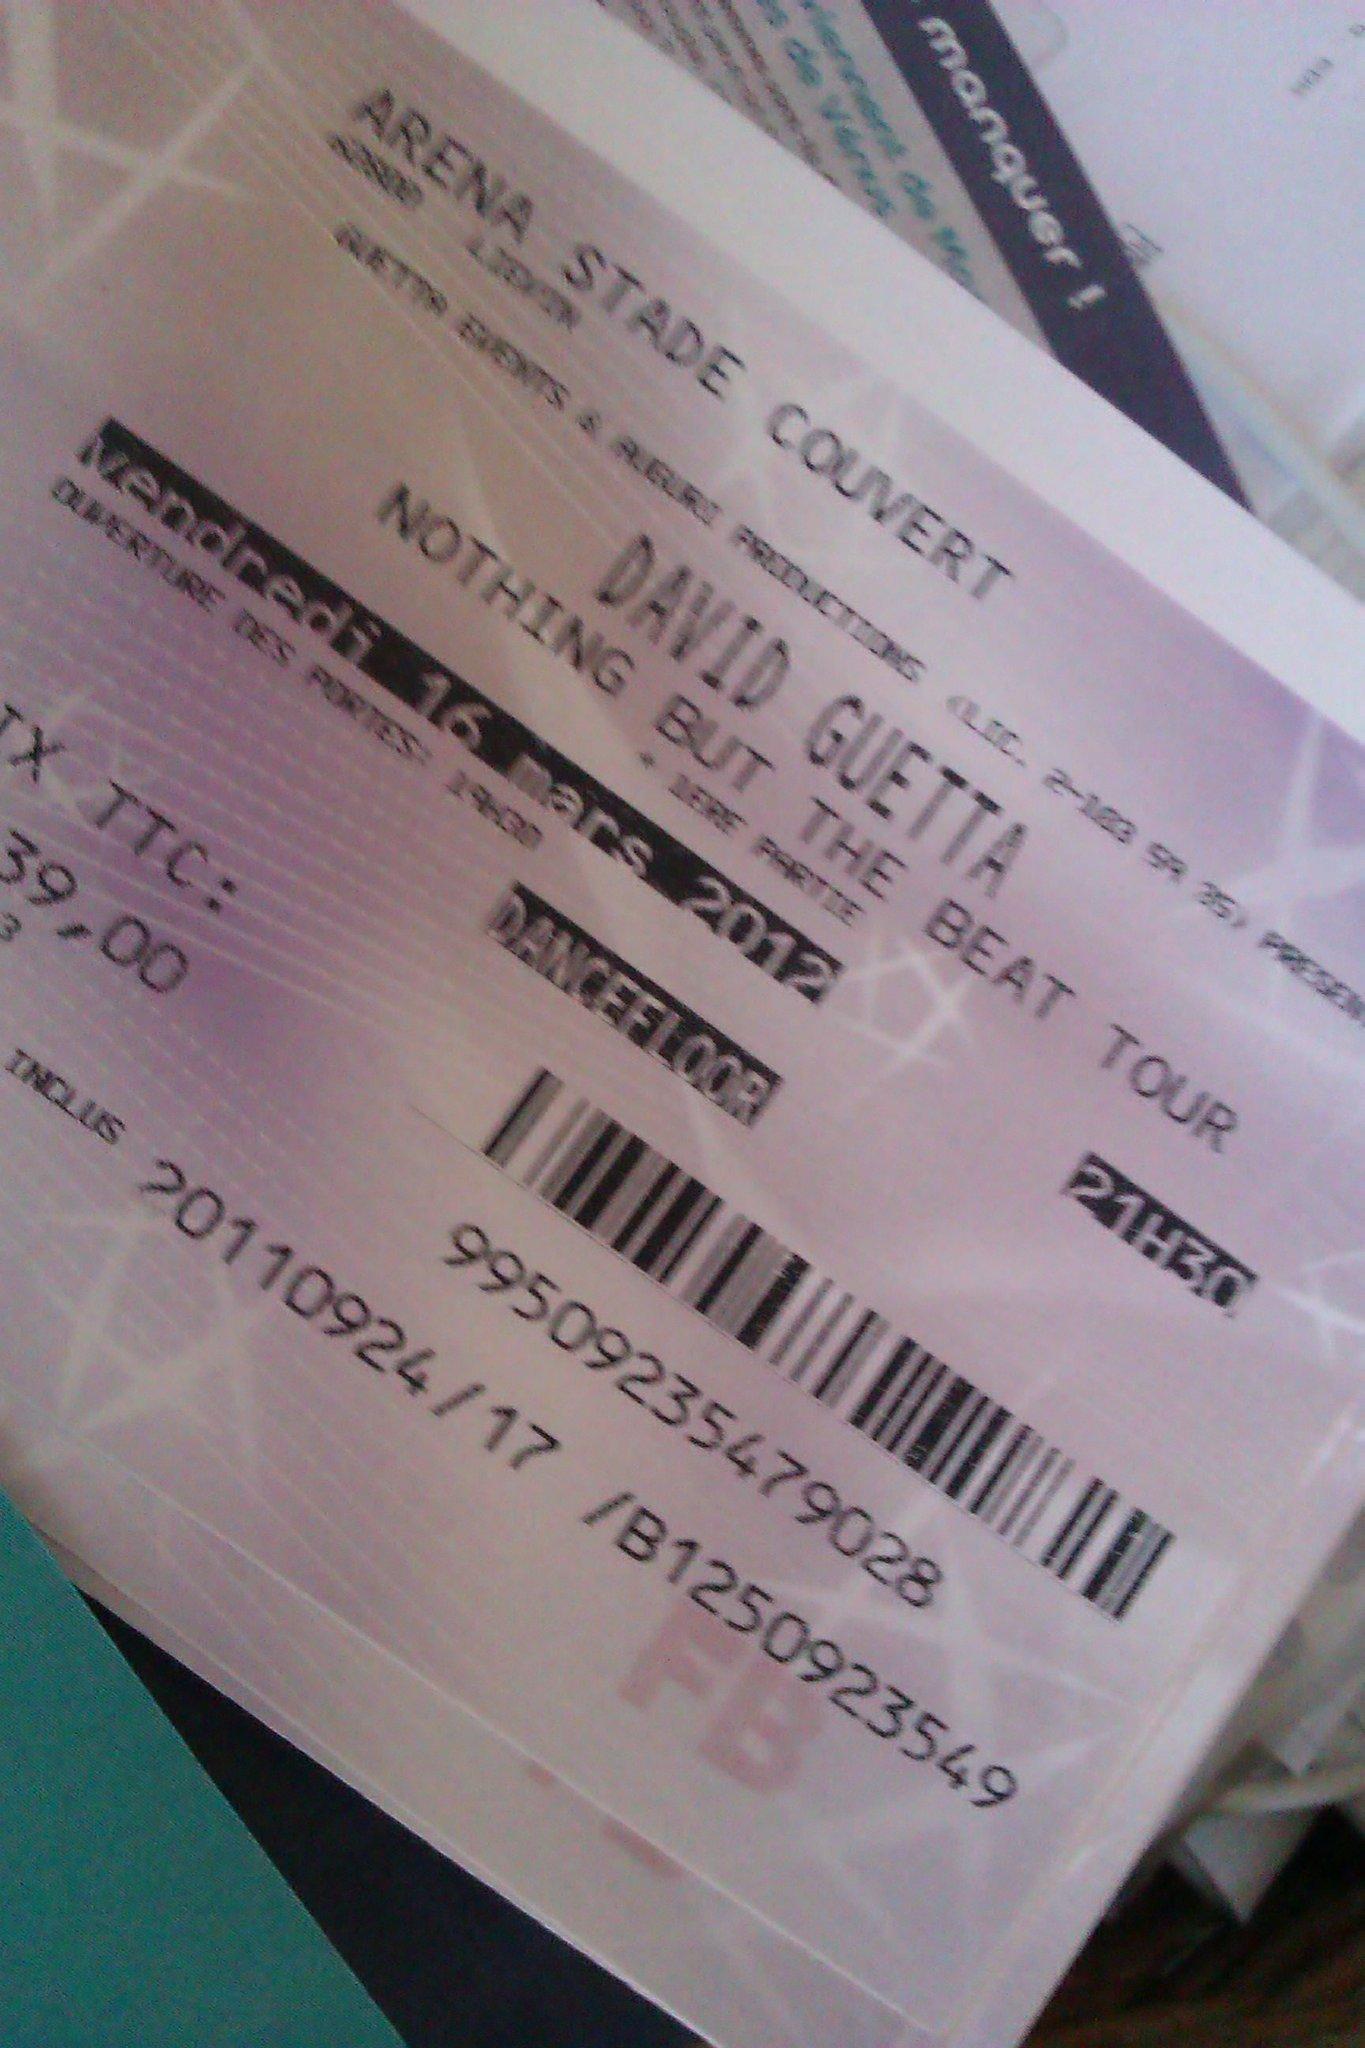 Encore quelques heures... #davidguetta @davidguetta @cathyguetta #guetta #nothingbutthebeattour http://t.co/cIi4avOs